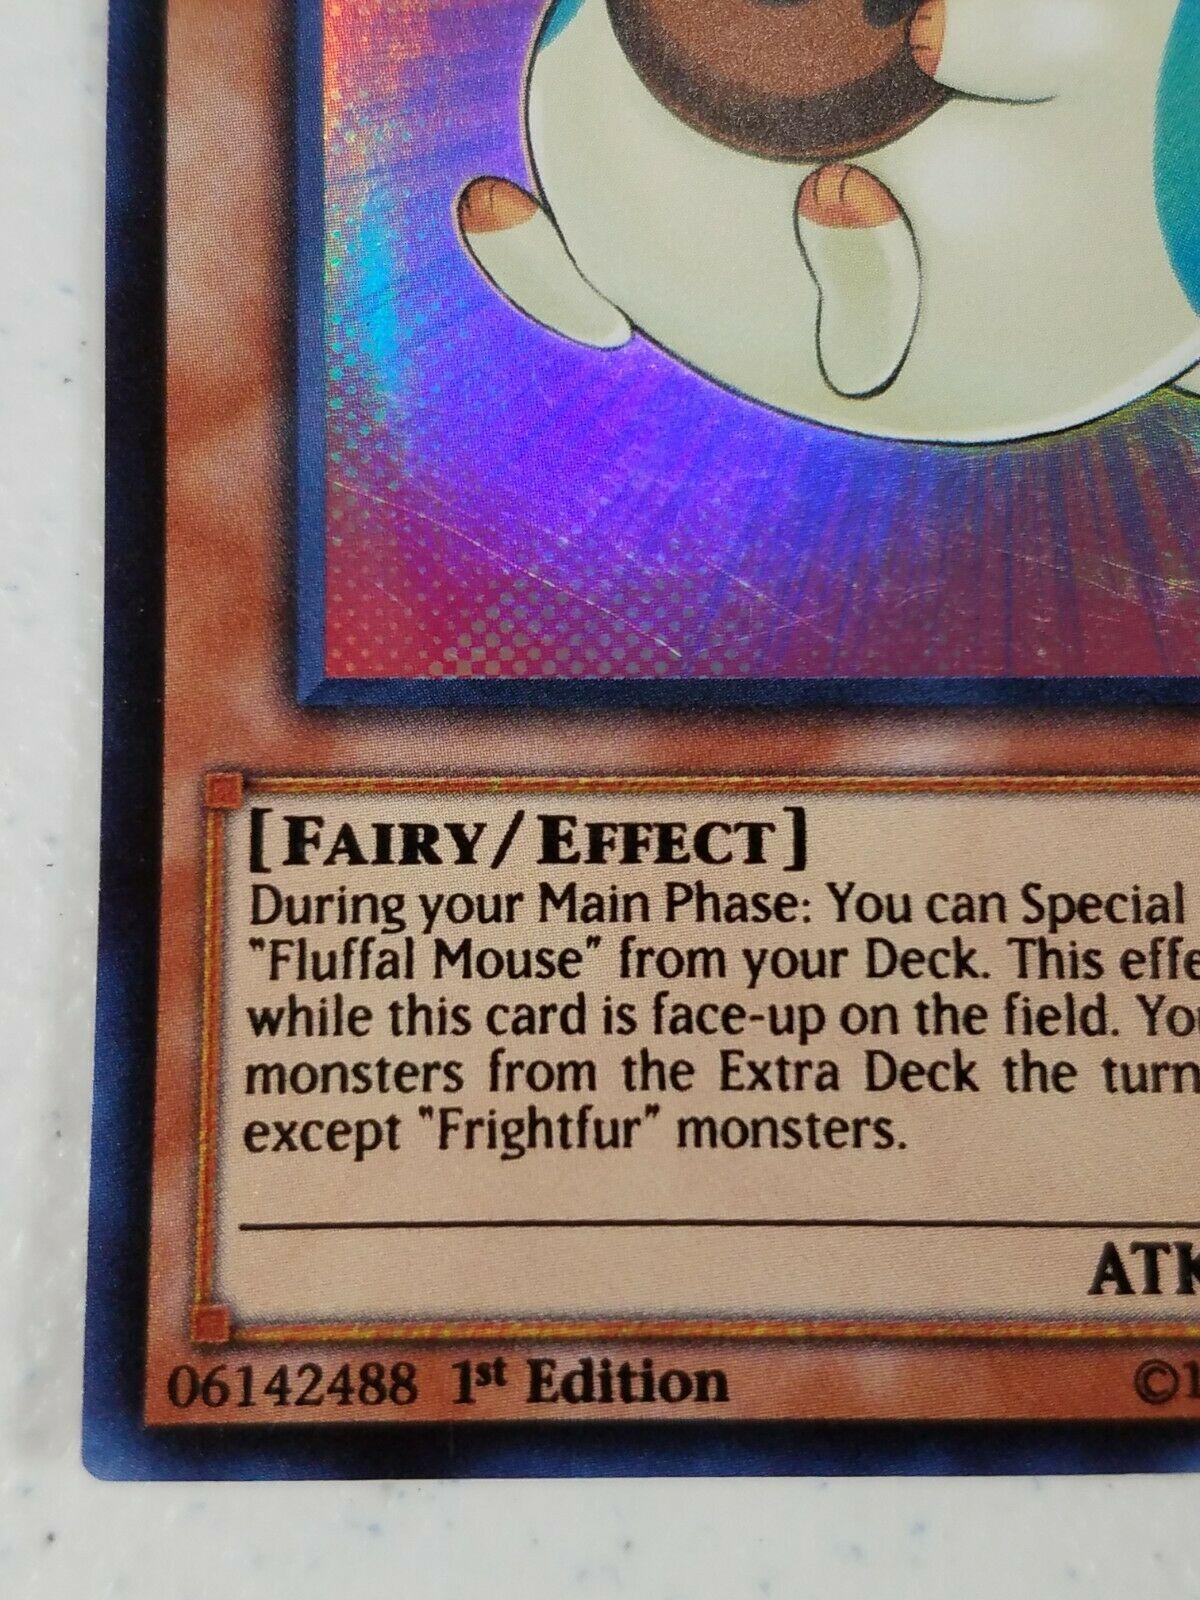 Yu-gi-oh! Trading Card - Fluffal Mouse - CORE-EN010 - Super Rare - 1st Ed.